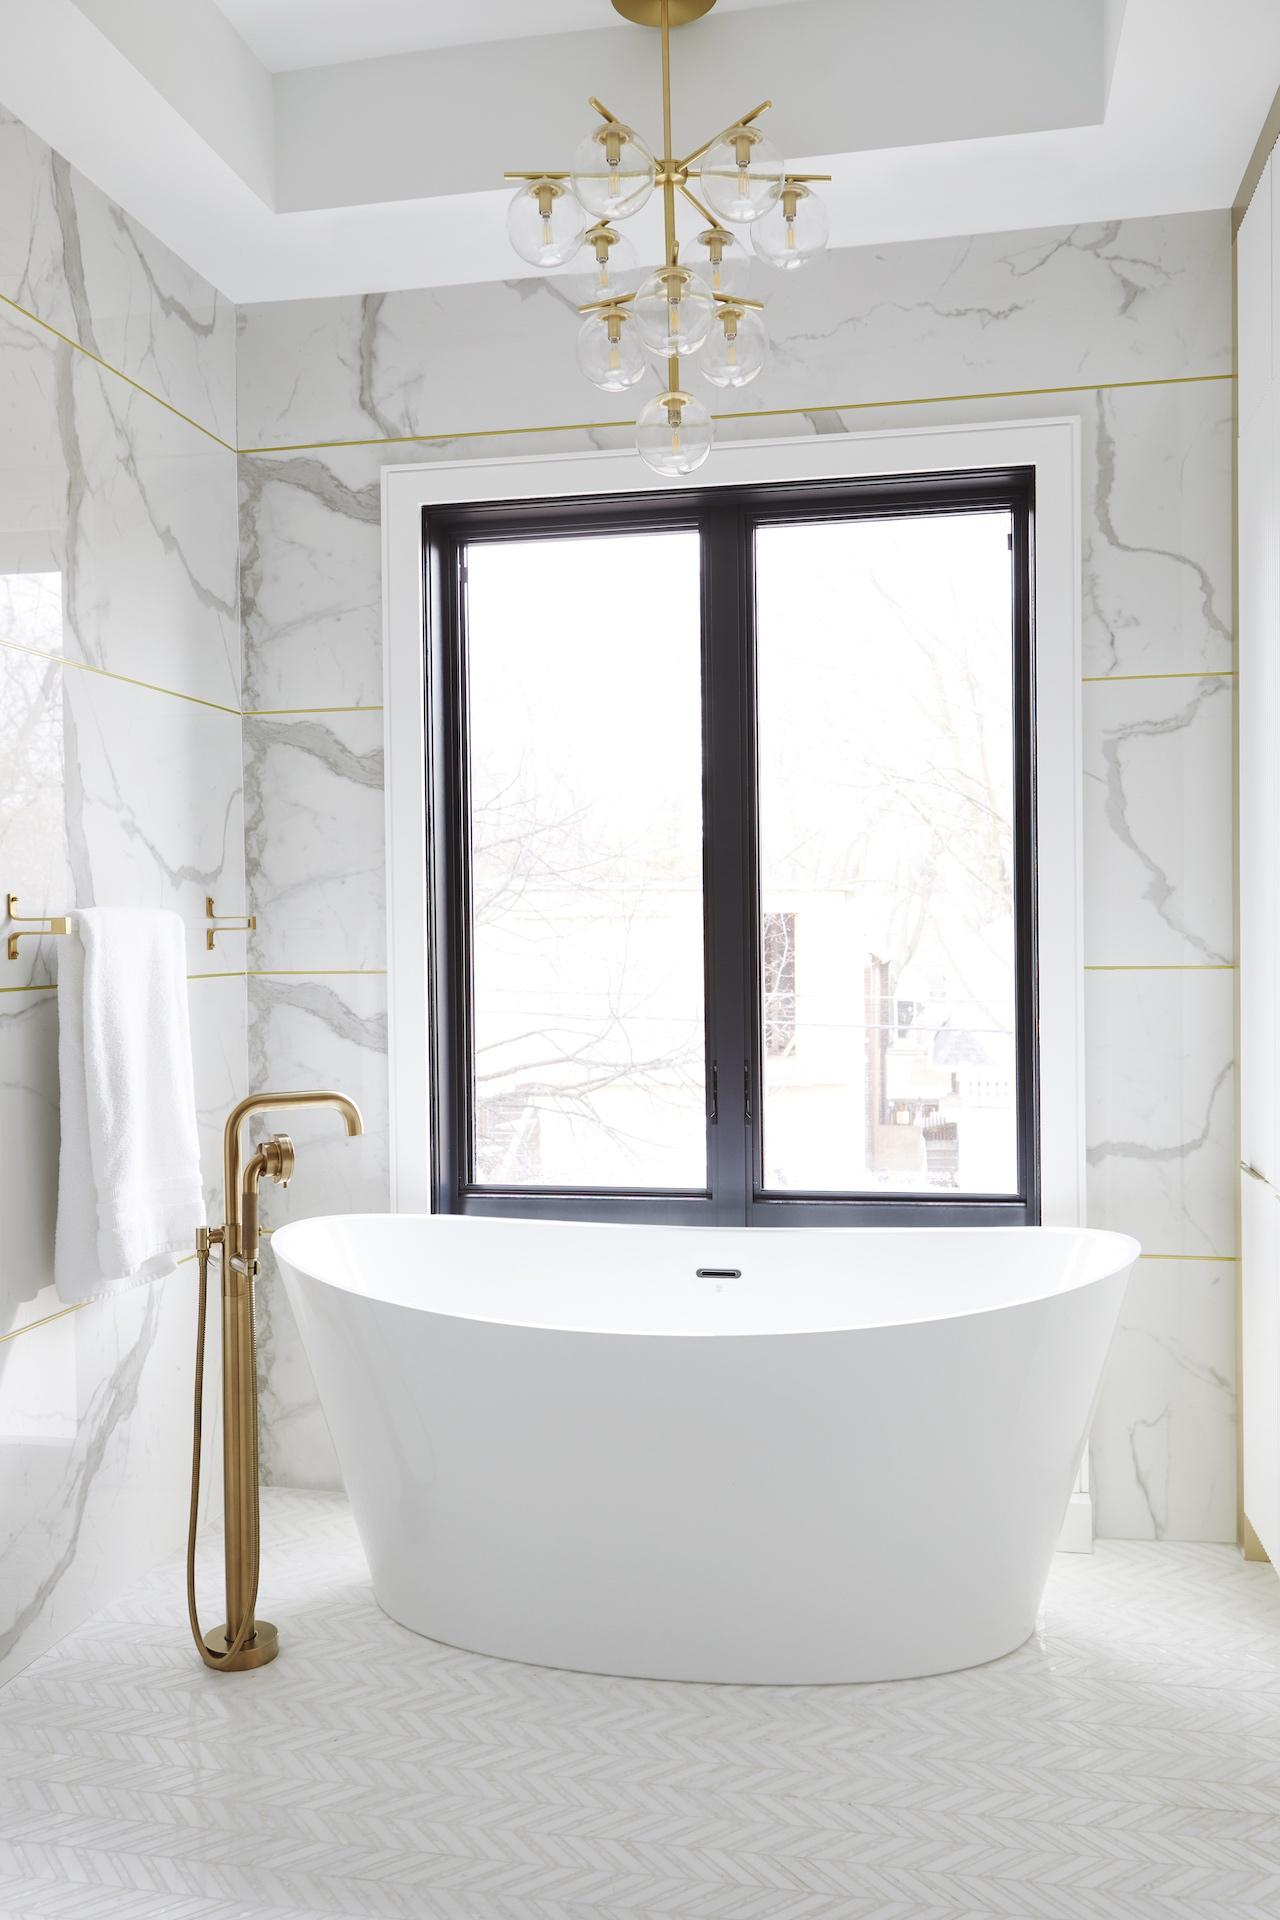 white bath tub under gold light